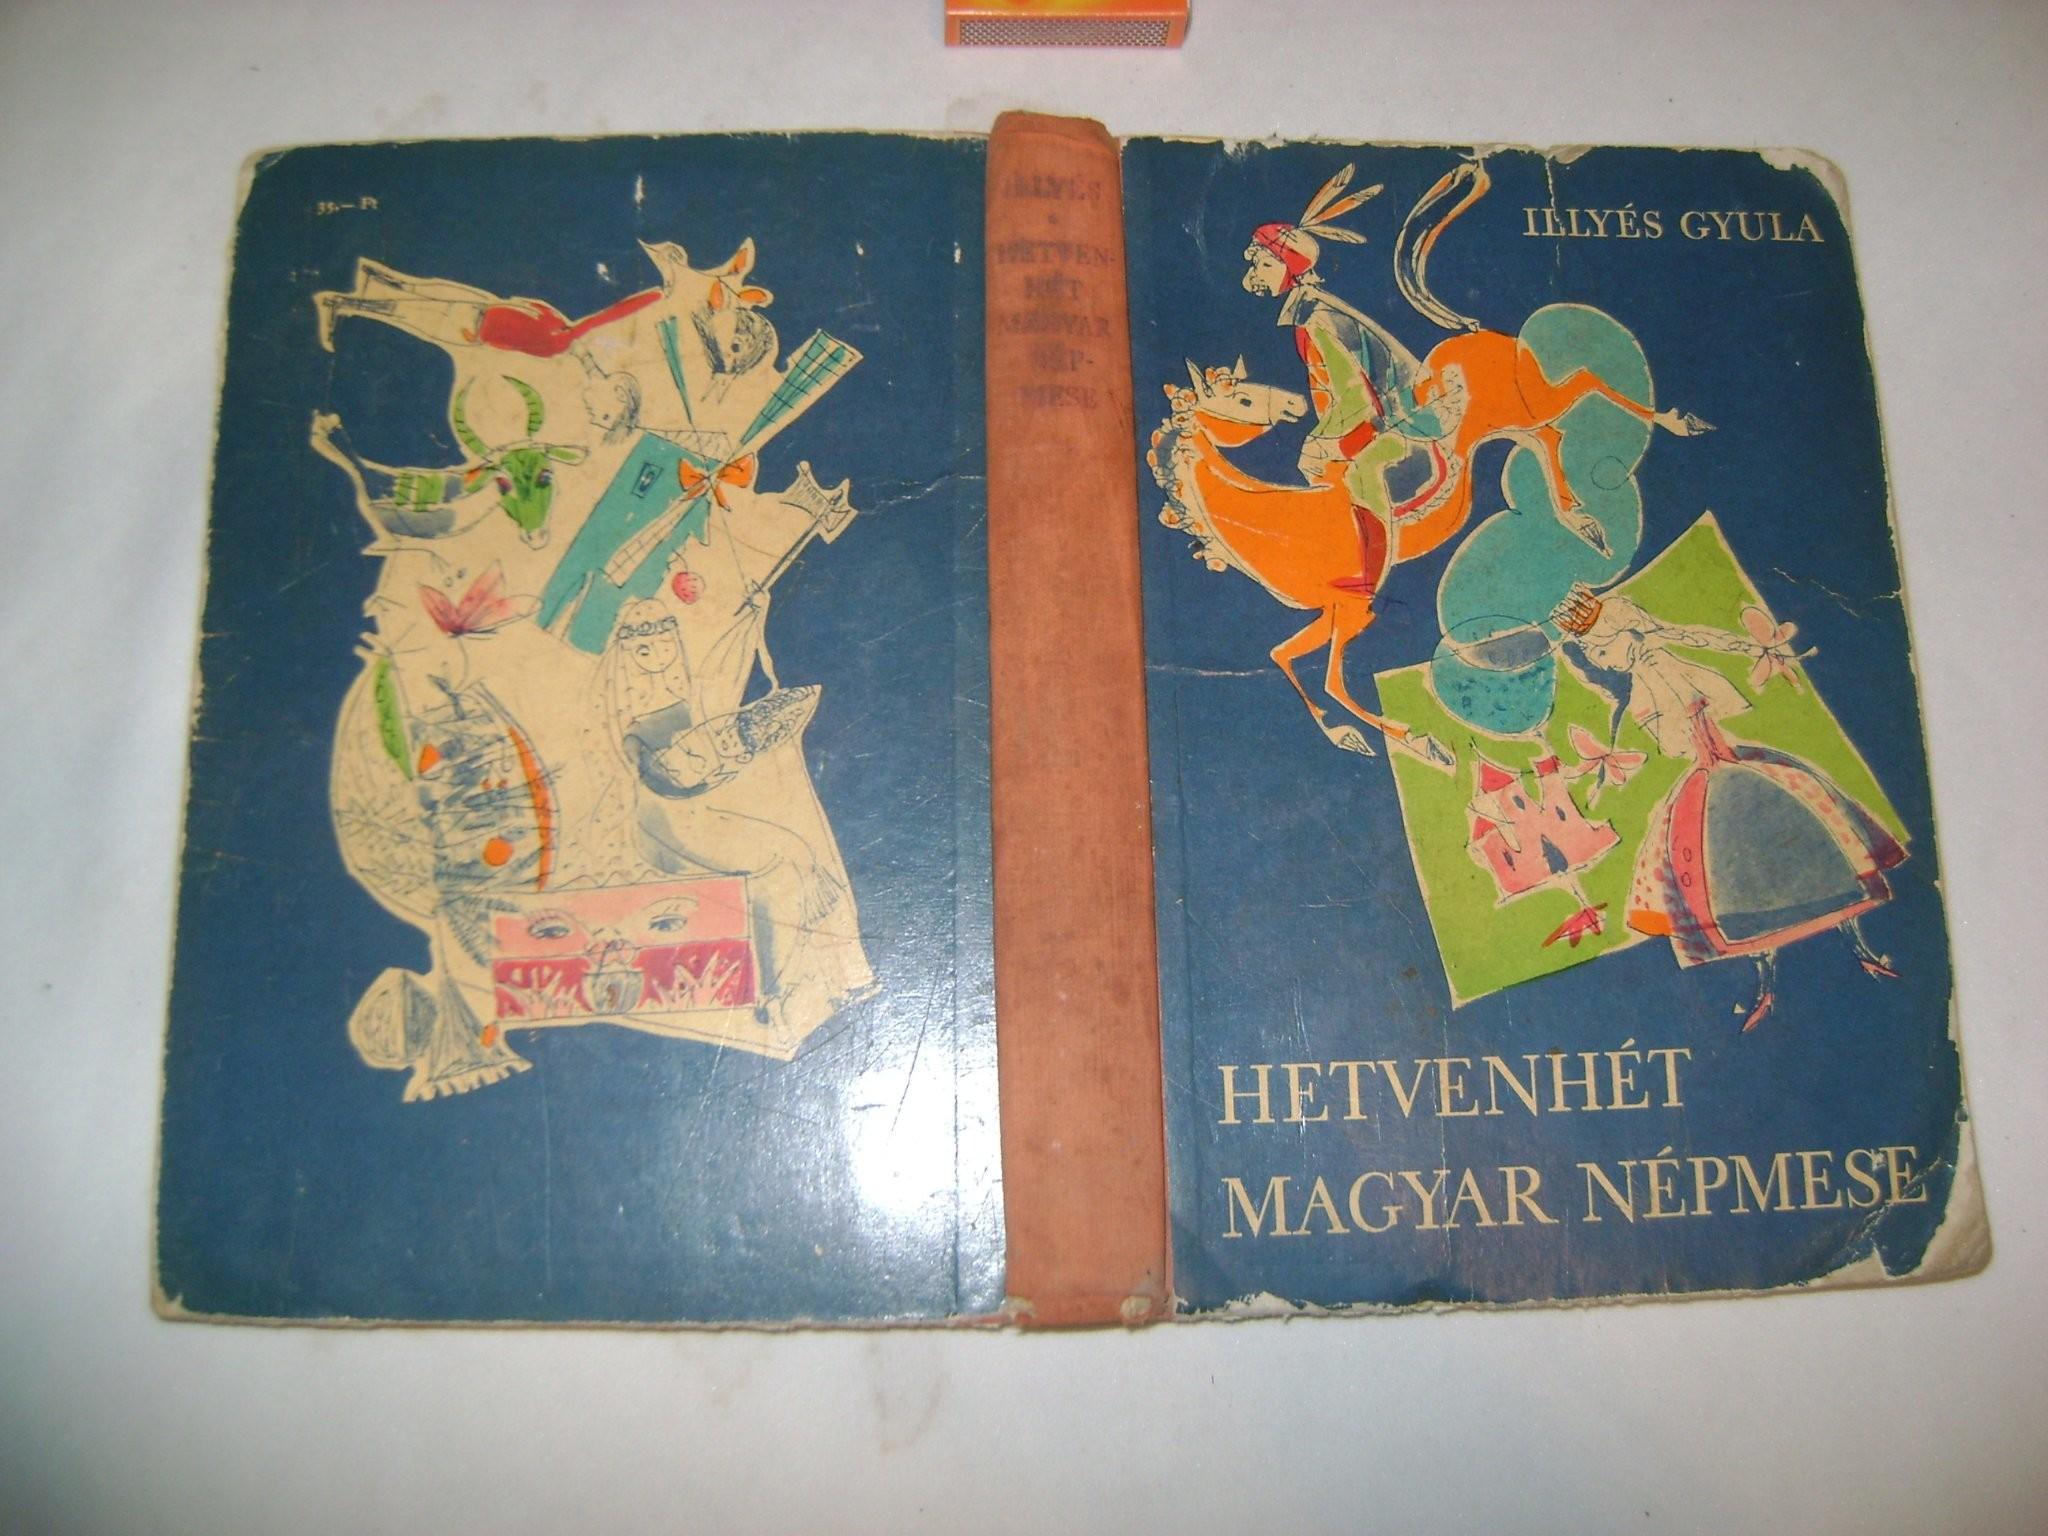 ad5f4117453abf3aea6e6b828f7d5bb9-illyes-gyula-hetvenhet-magyar-nepmese-1964.jpg